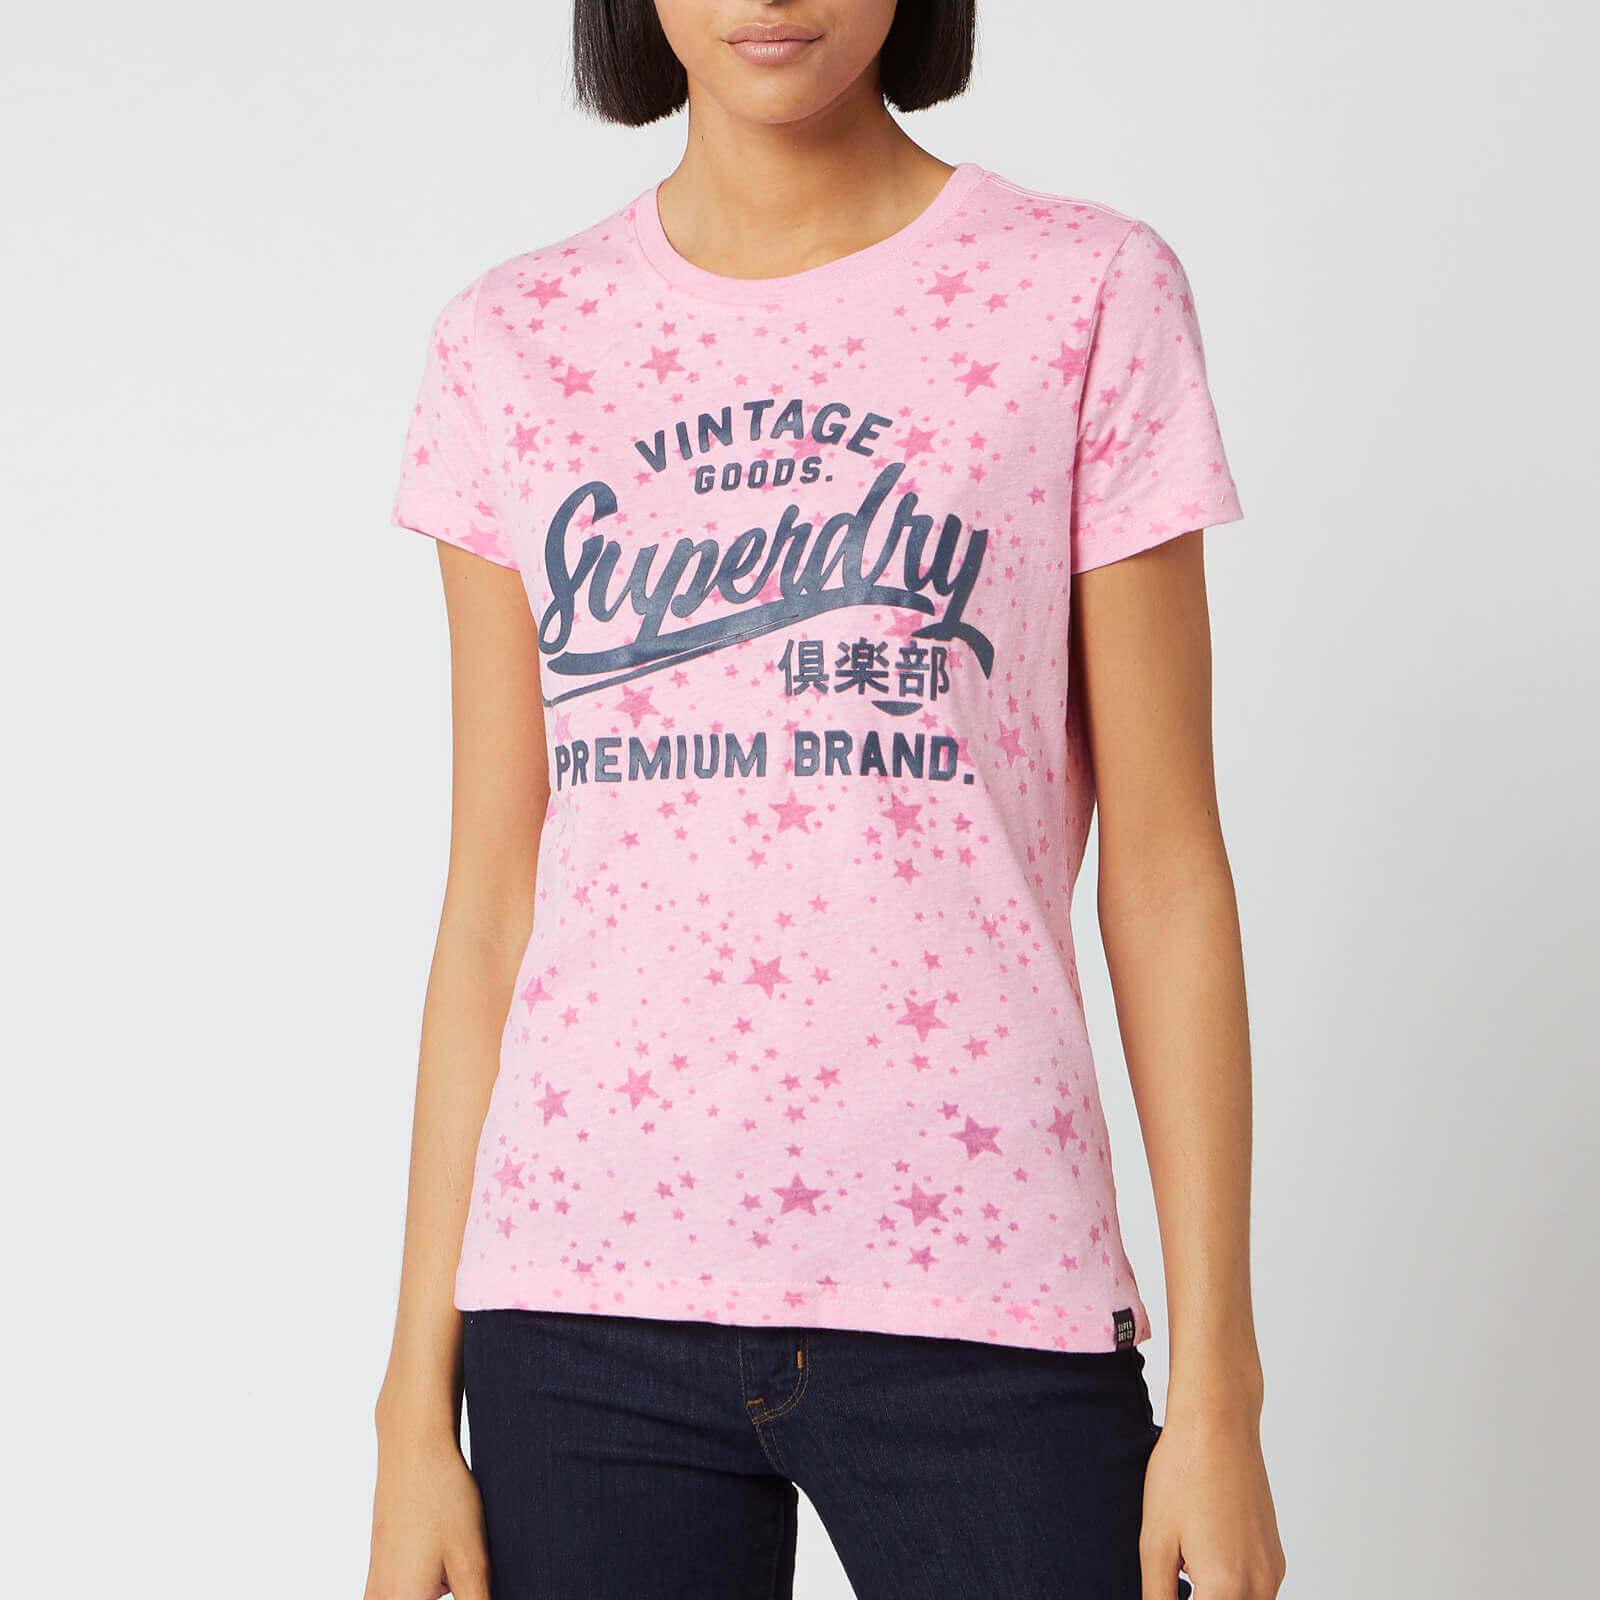 Superdry Women's Vintage Goods Star Aop Entry T-Shirt - Cherry Blossom Burn Out - UK 12 - Pink